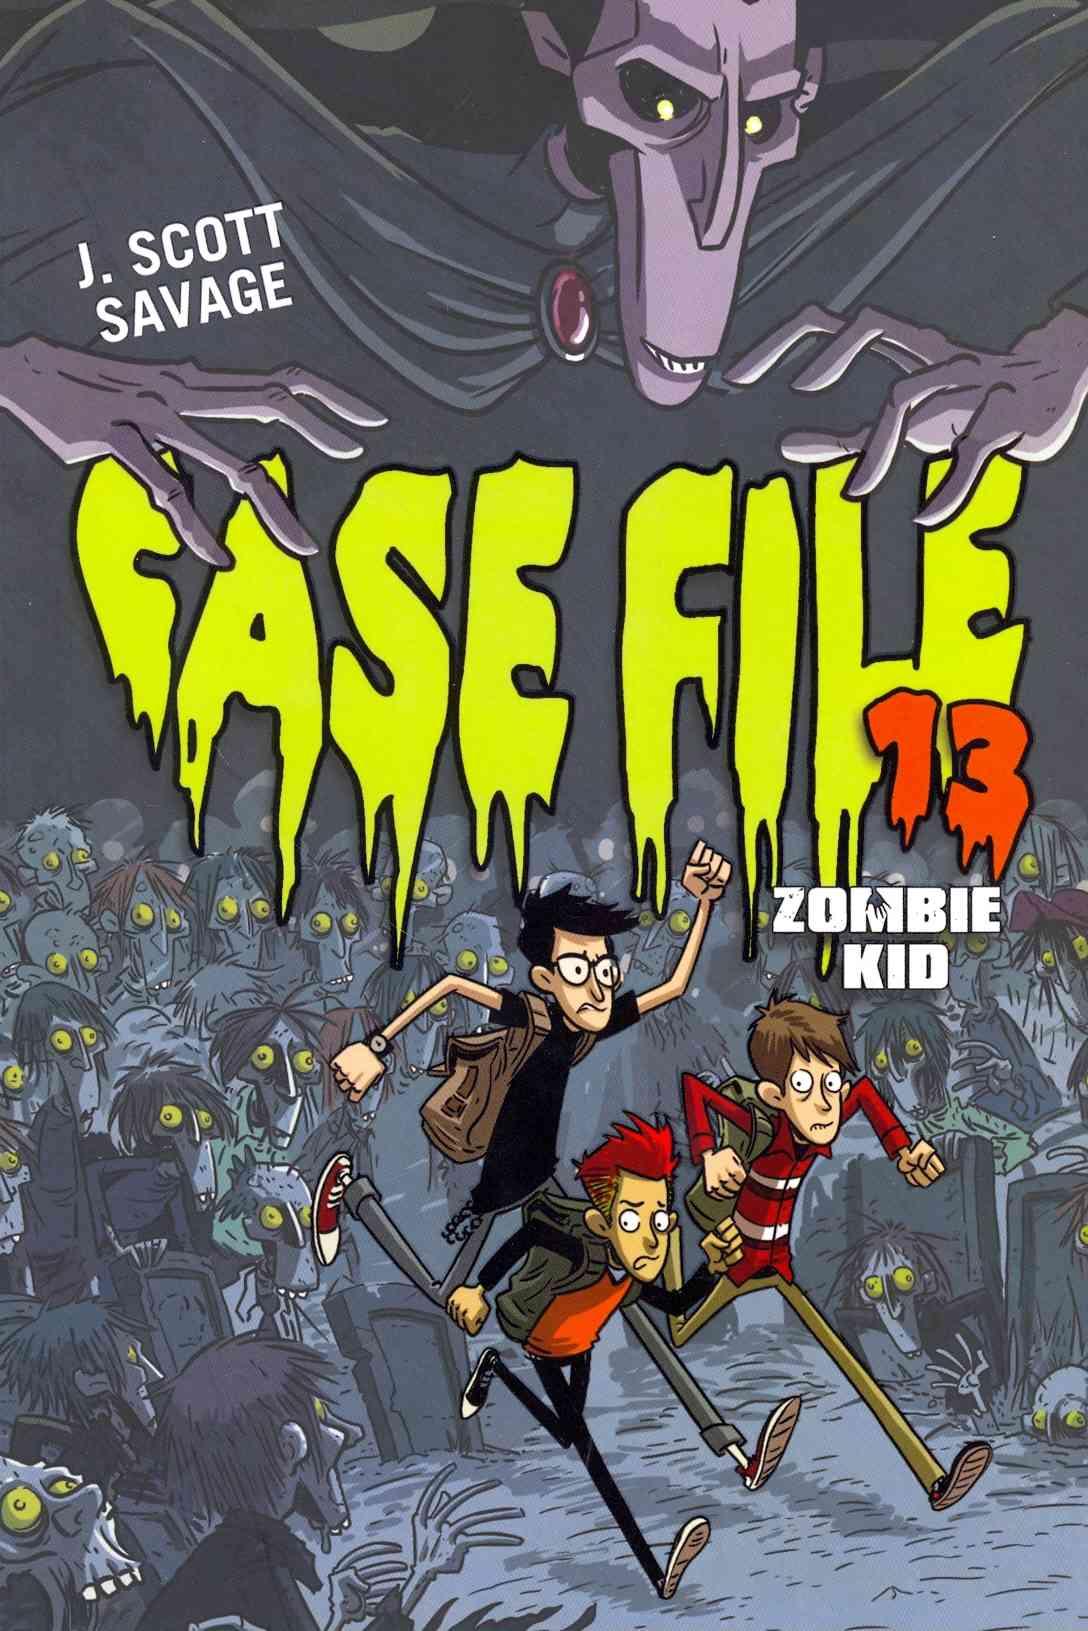 Case File 13 By Savage, J. Scott